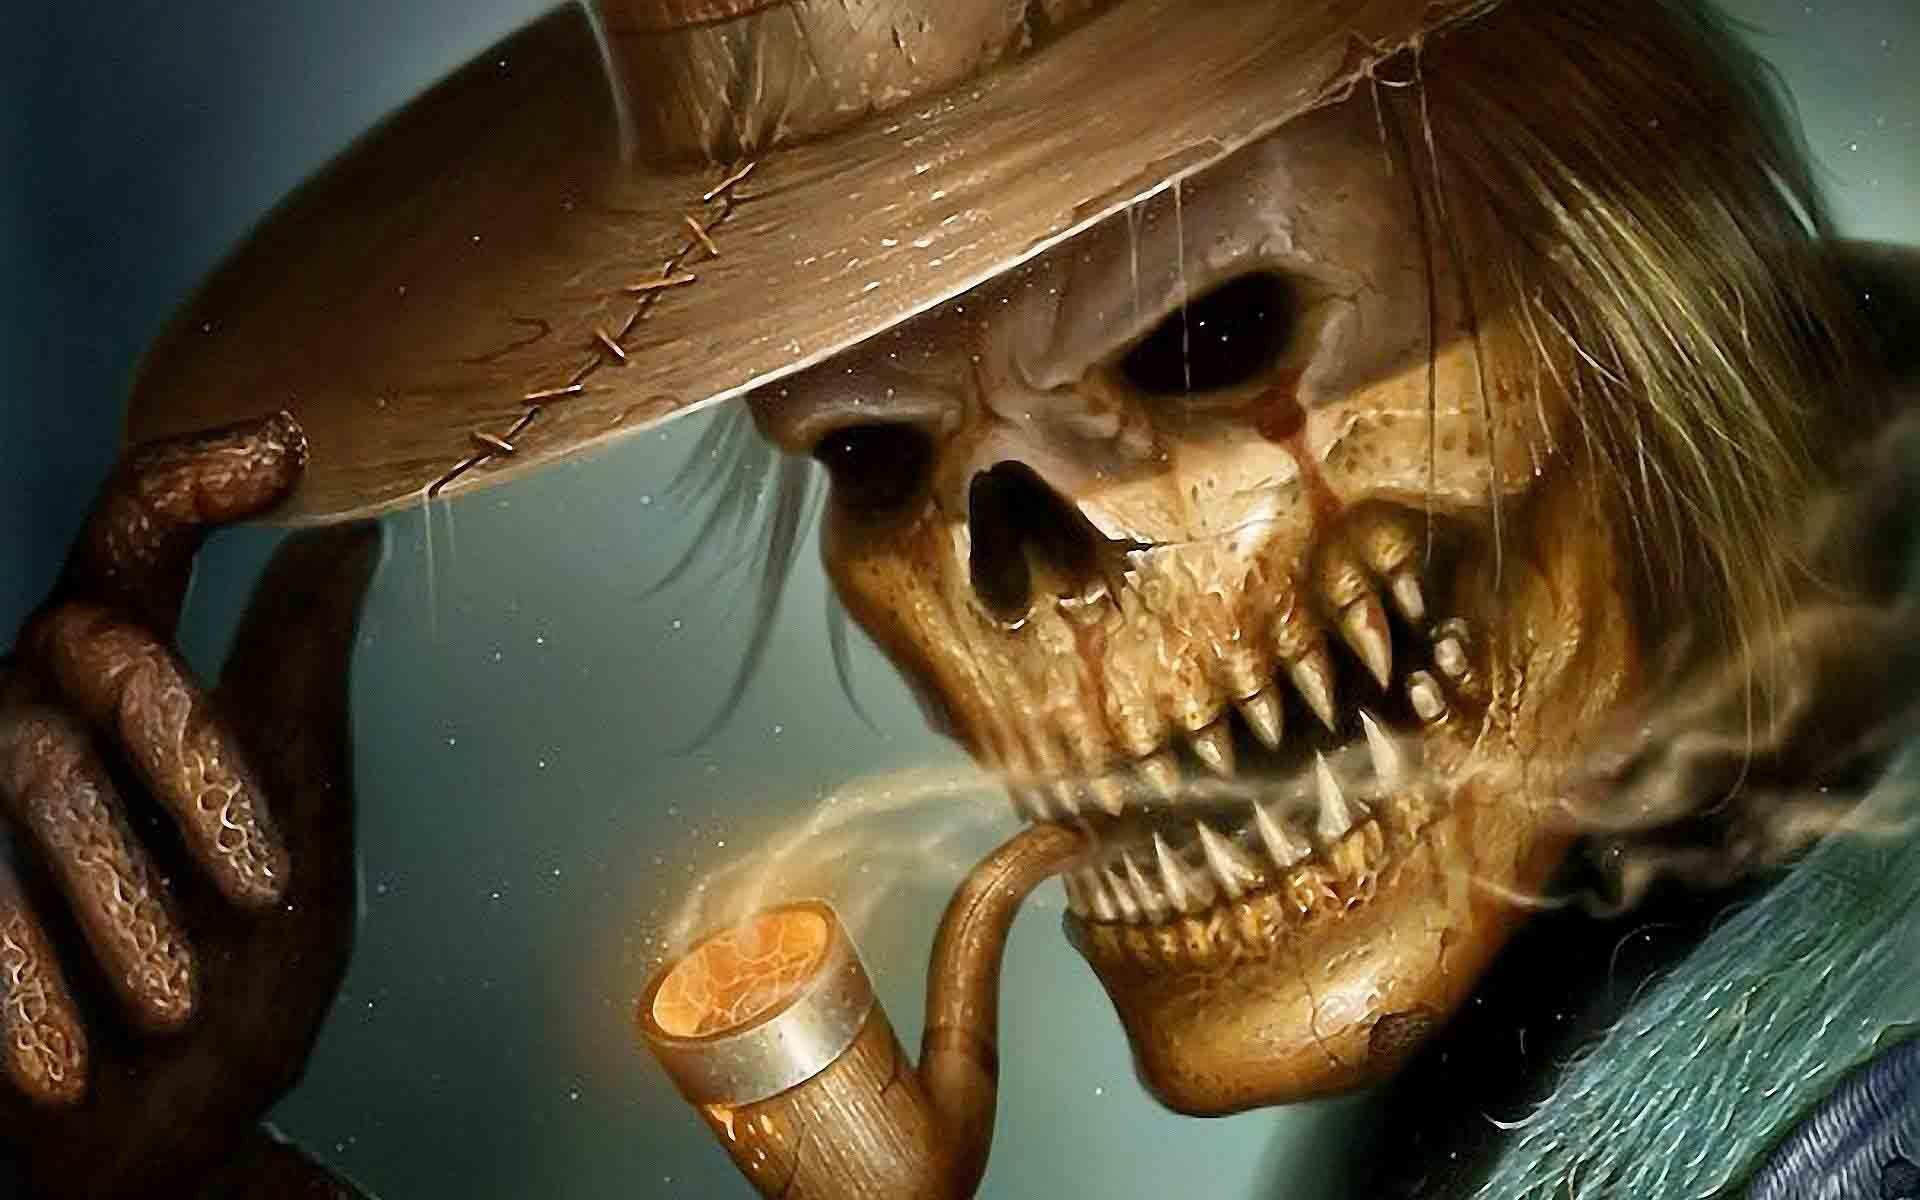 Skeleton Hd Wallpapers Desktop Widescreen Bone Art Skull Wallpaper Halloween Skeletons